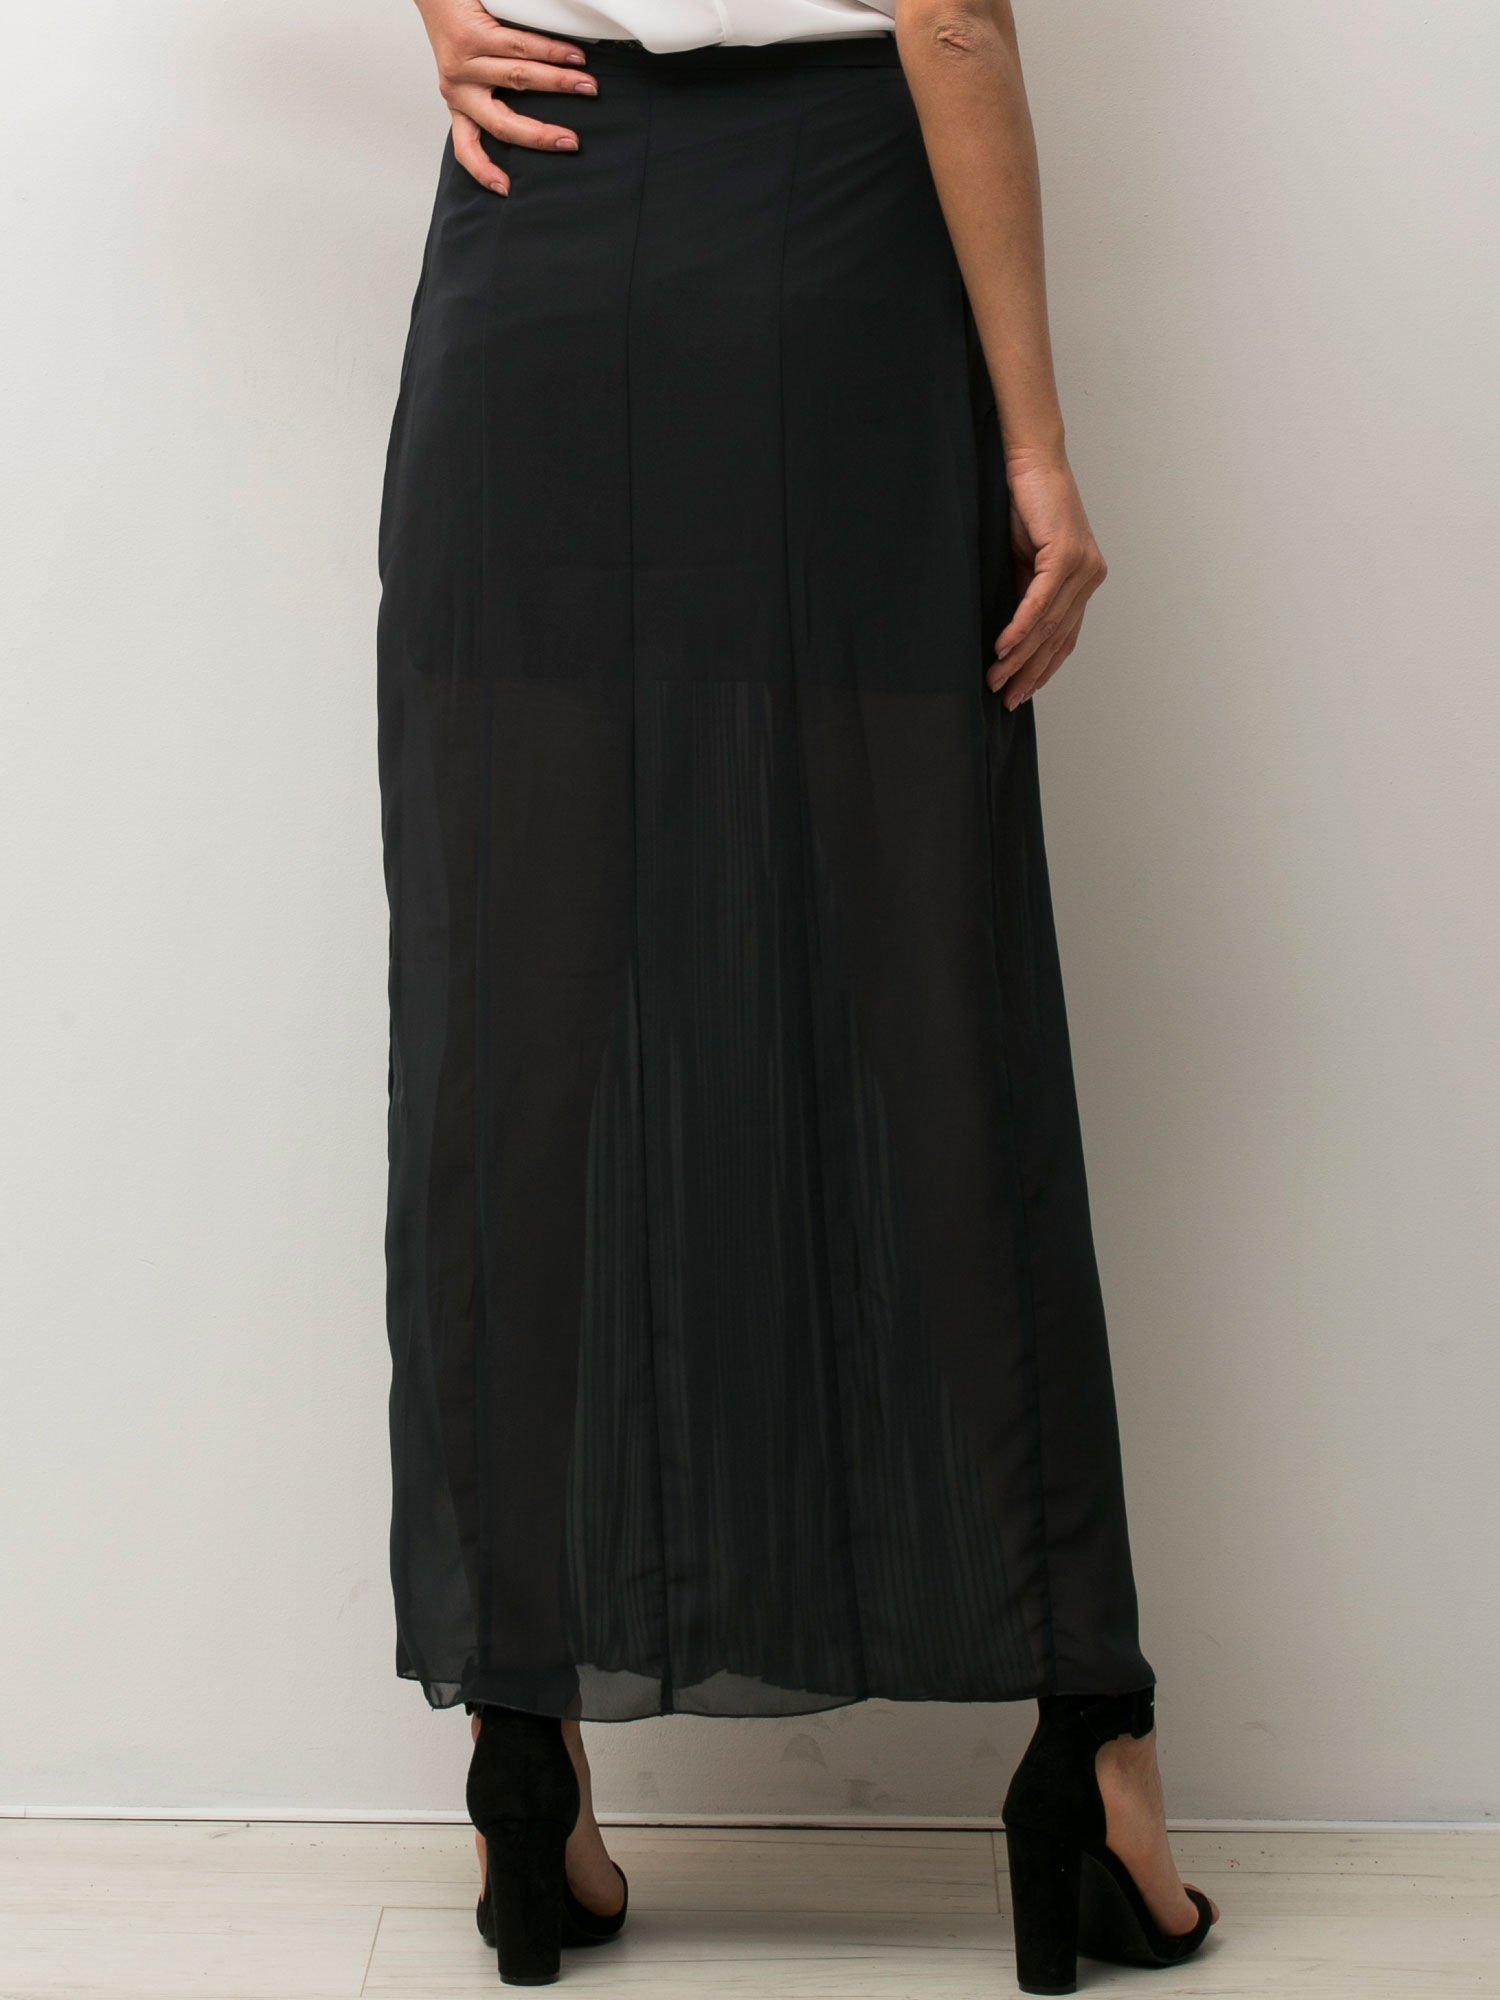 Czarna półtransparentna spódnica maxi plisowana                                  zdj.                                  2